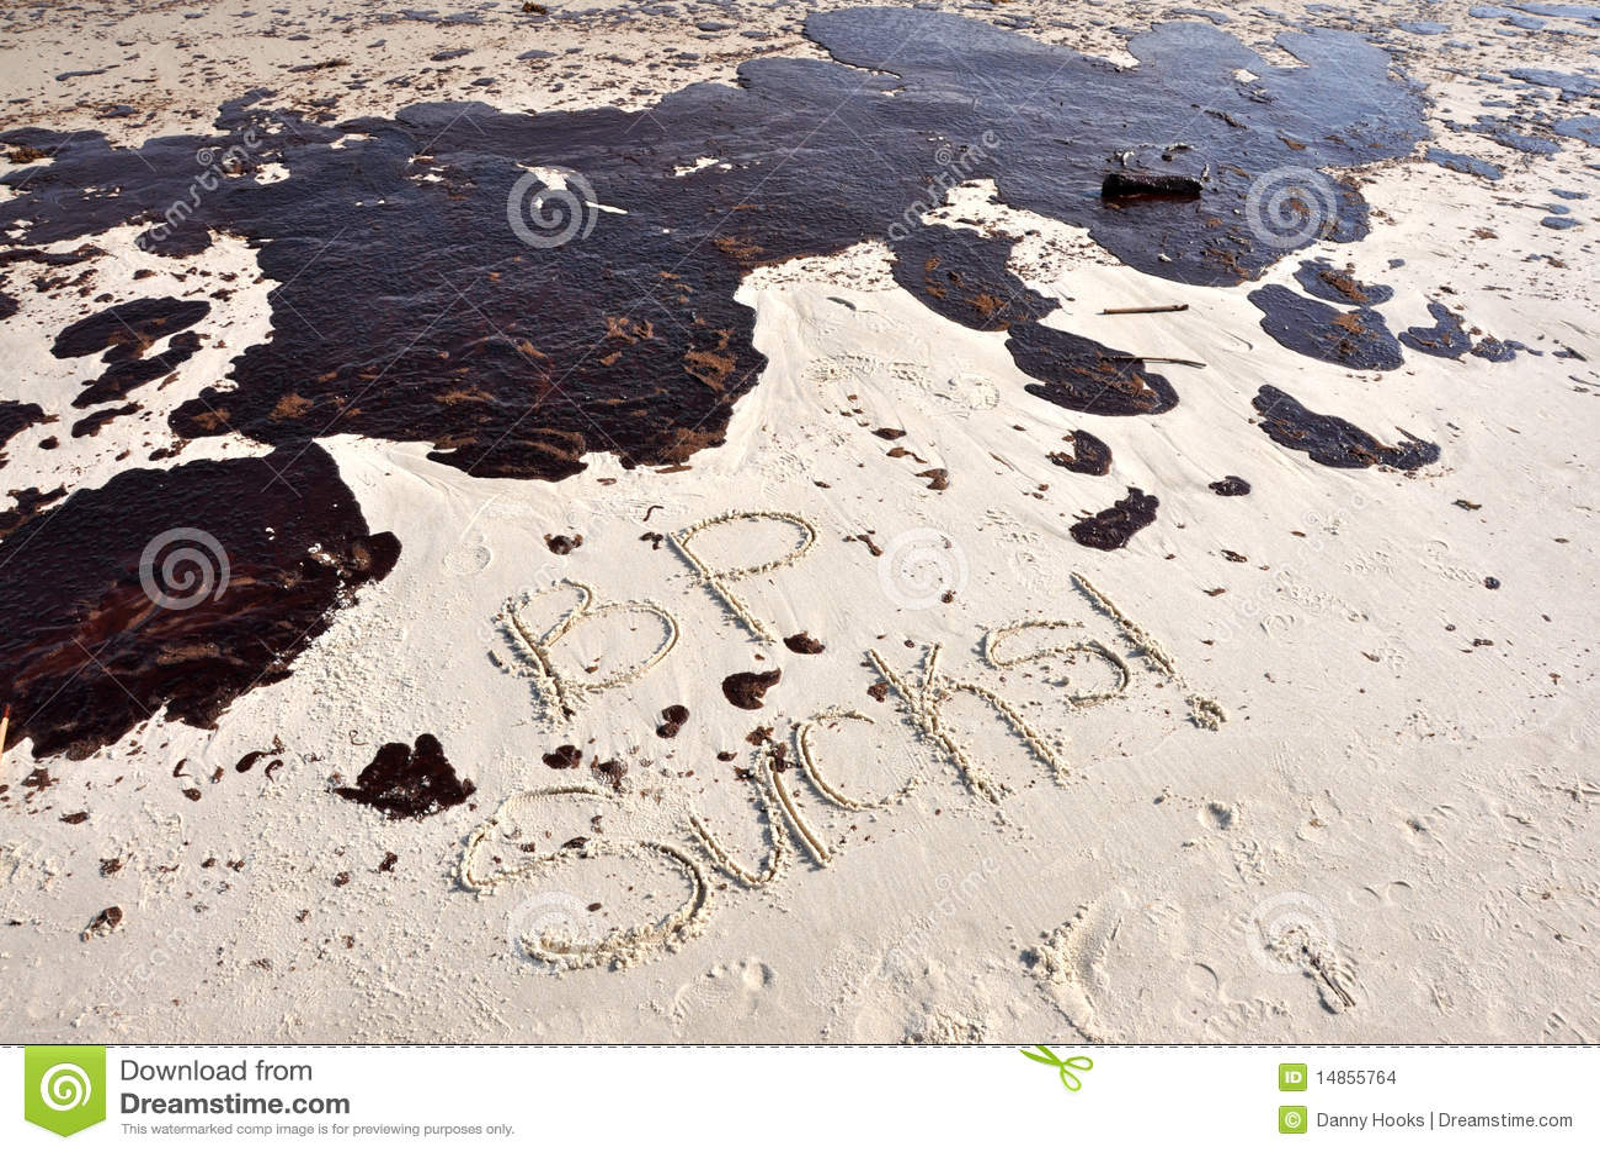 BP Oil Spill in Gulf